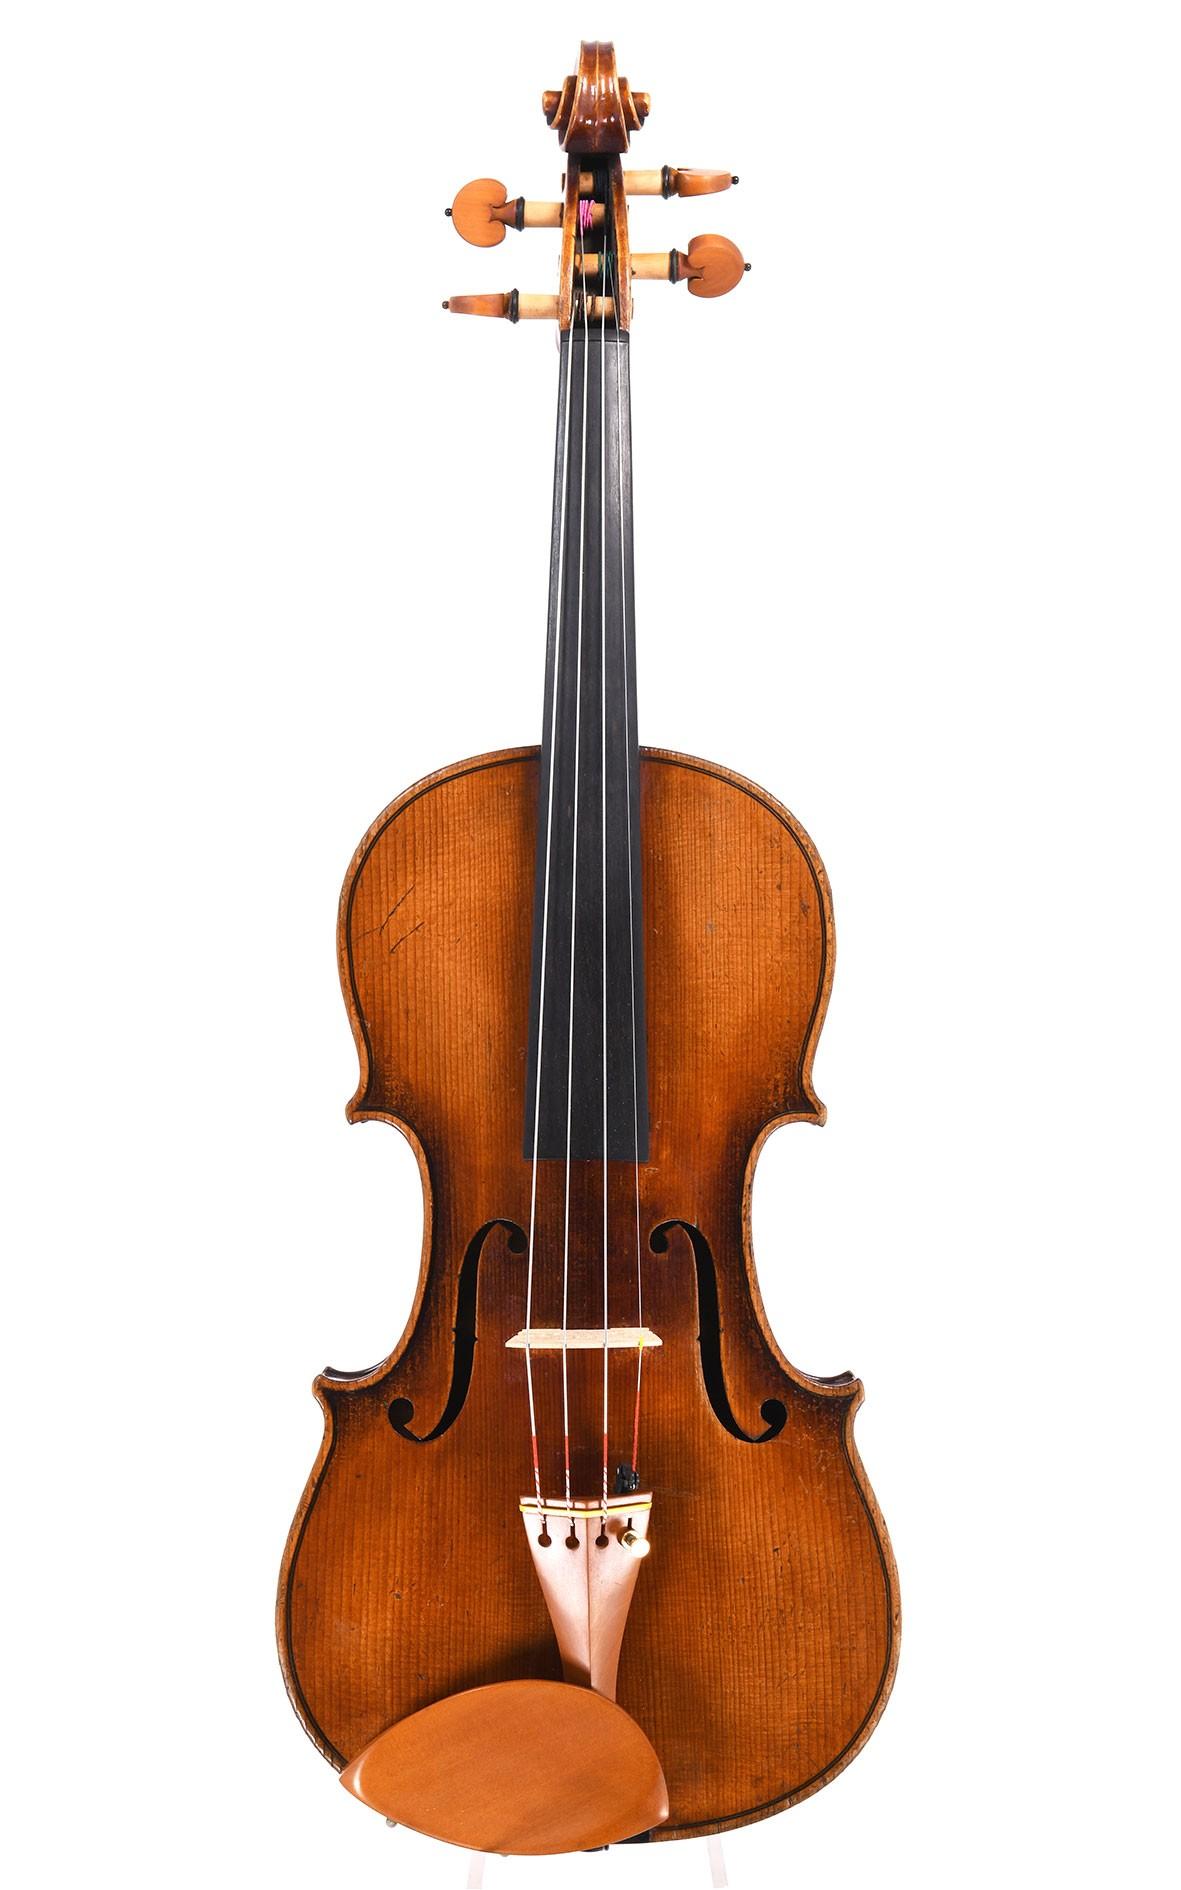 Violin from Saxony, approx. 1940 - powerful warm sound